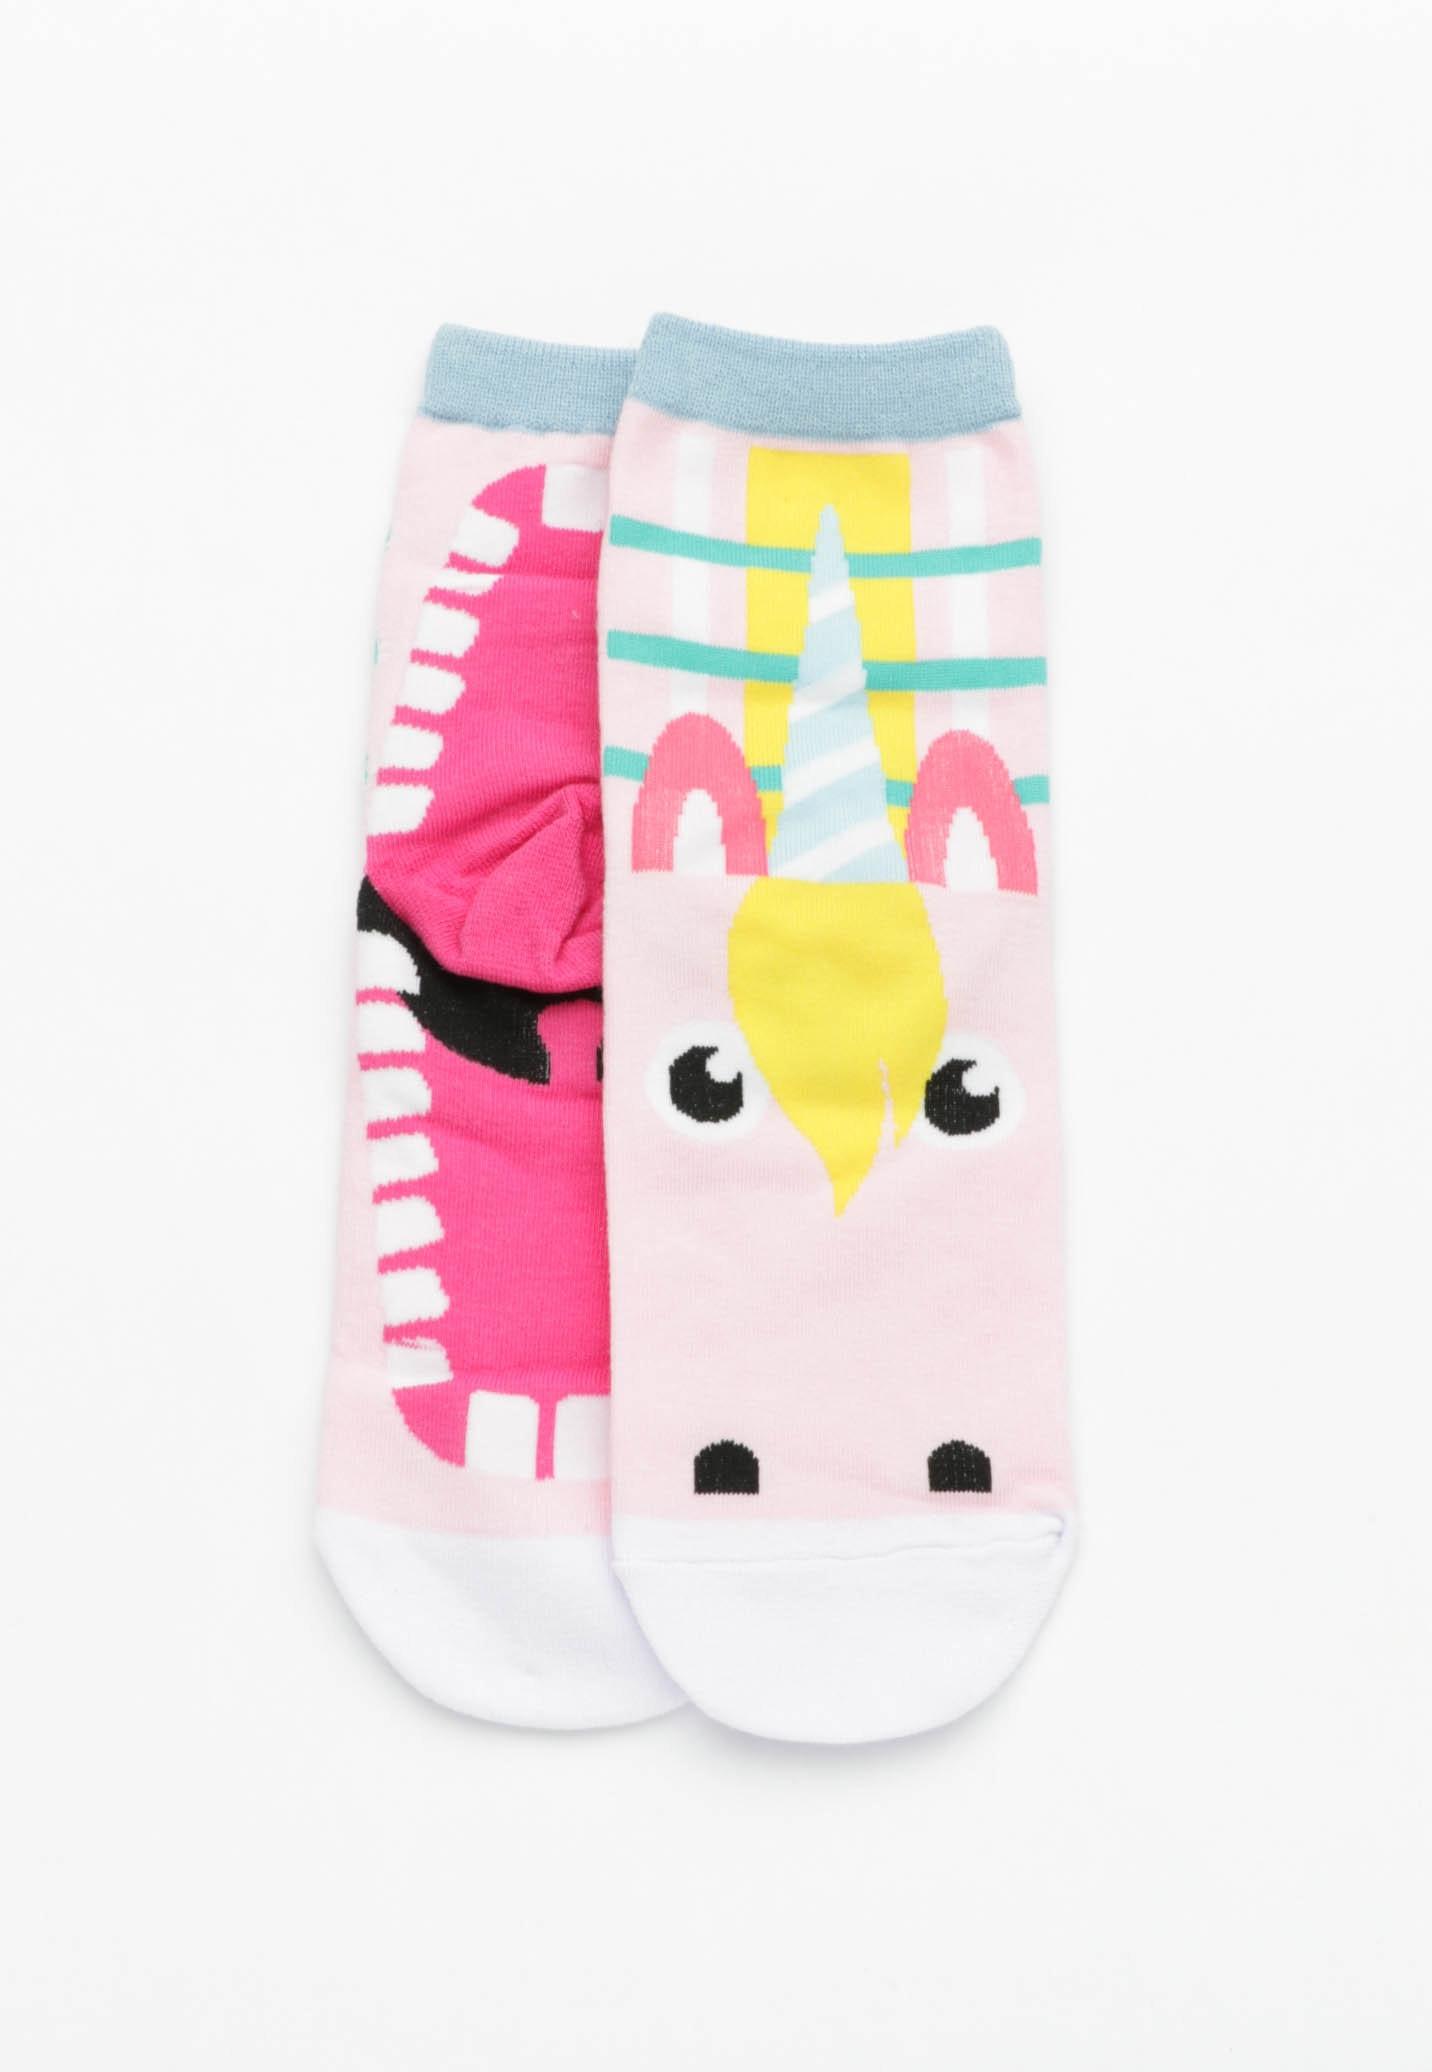 Unicorn Mouth Socks - Baby Pink